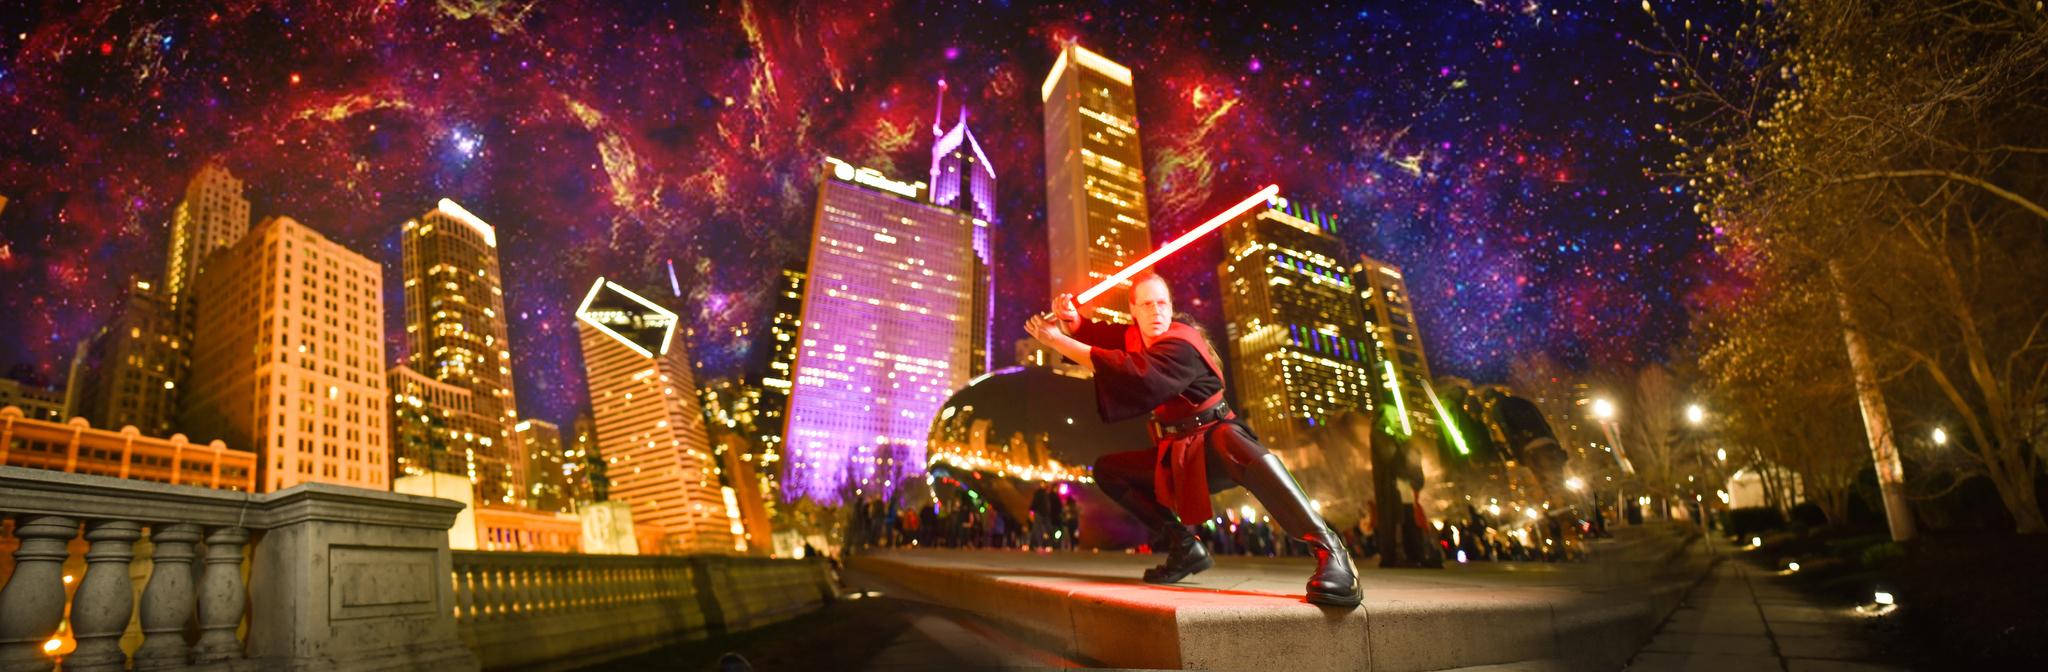 2019.04.14 - Star Wars Celebration Chicago 288842.JPG